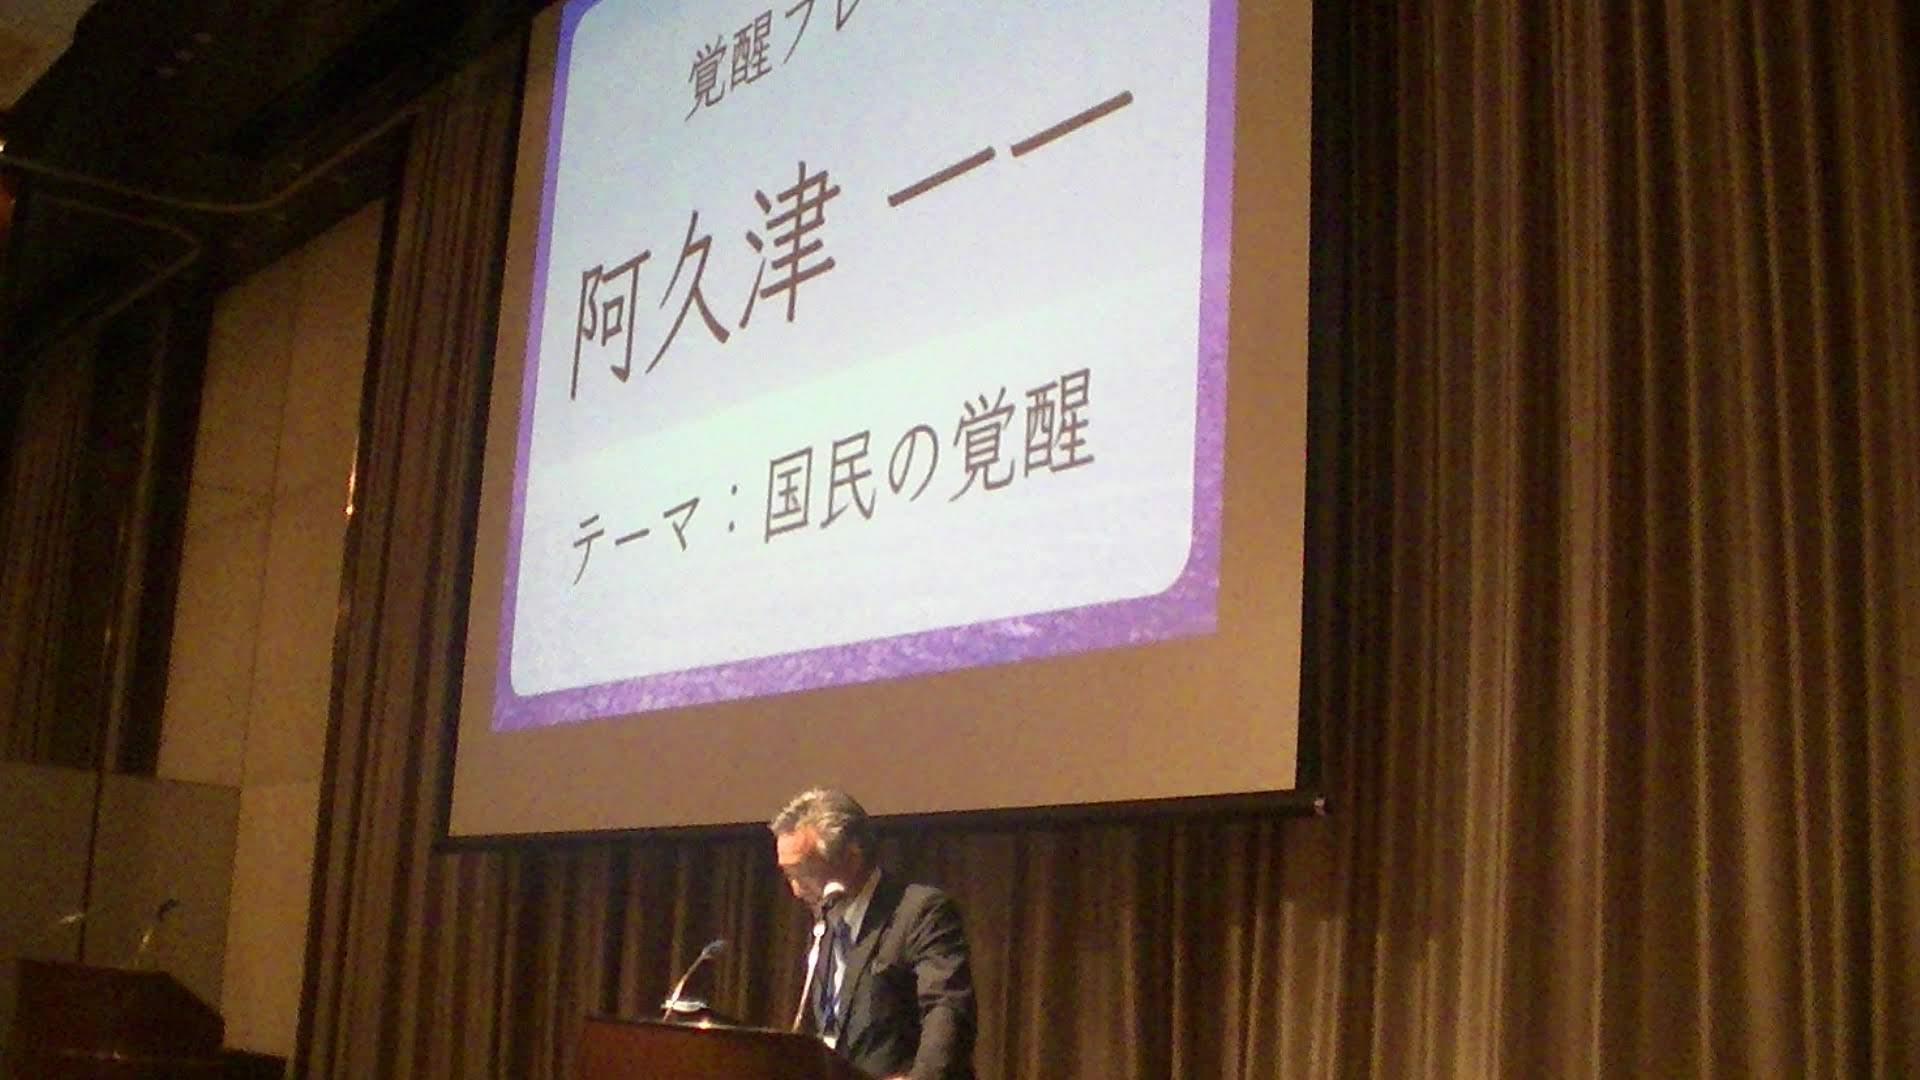 PIC 1765 1 - 思風会全国大会in広島